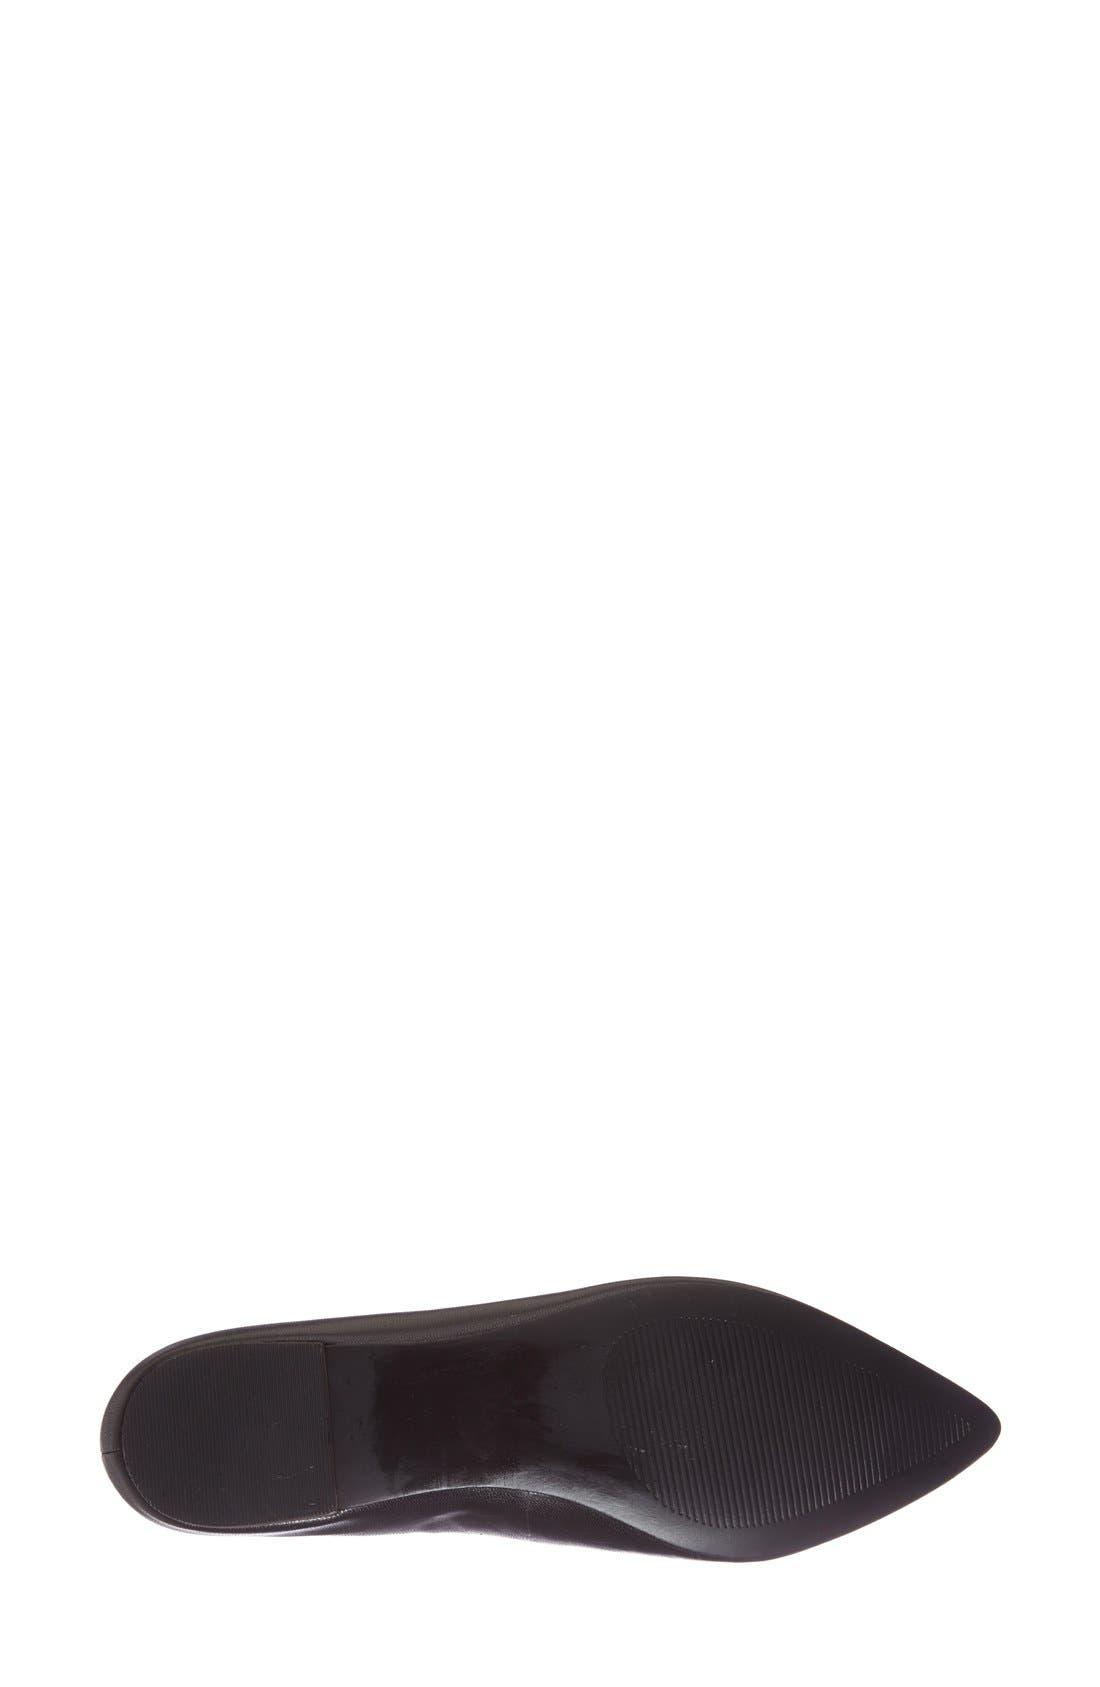 Alternate Image 4  - Sole Society 'Cammila' Pointy Toe Loafer (Women)